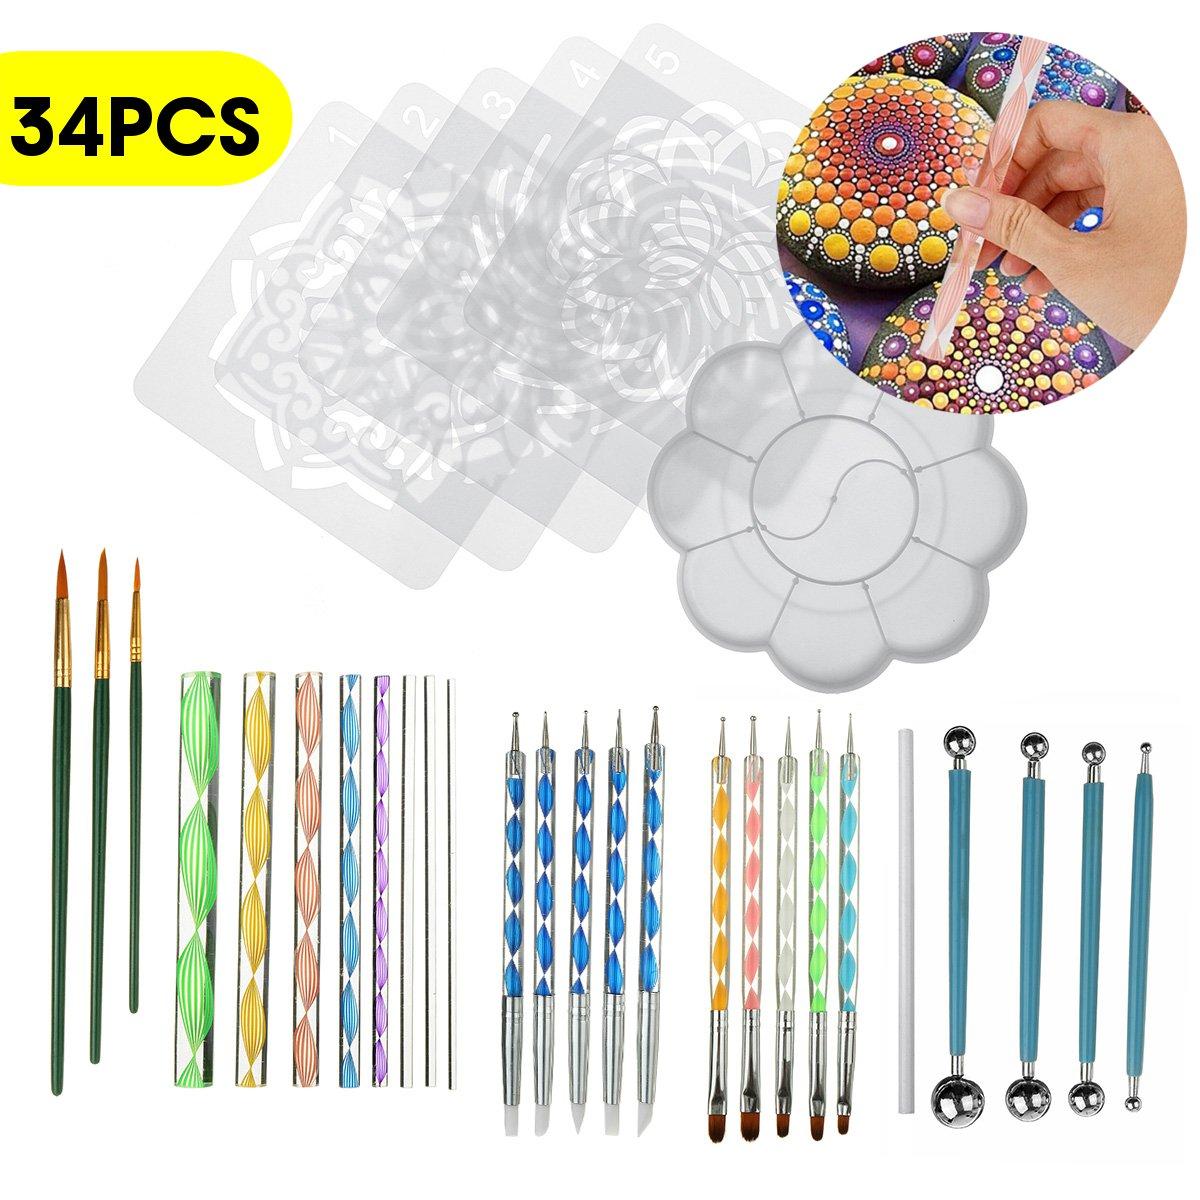 20PCS/ 25PCS/34PCS Dotting Rods Ball Stylus Pens Mandala Painting Dotting Tools Wood Rocks Art Craft Drawing DIY Nail Art Craft